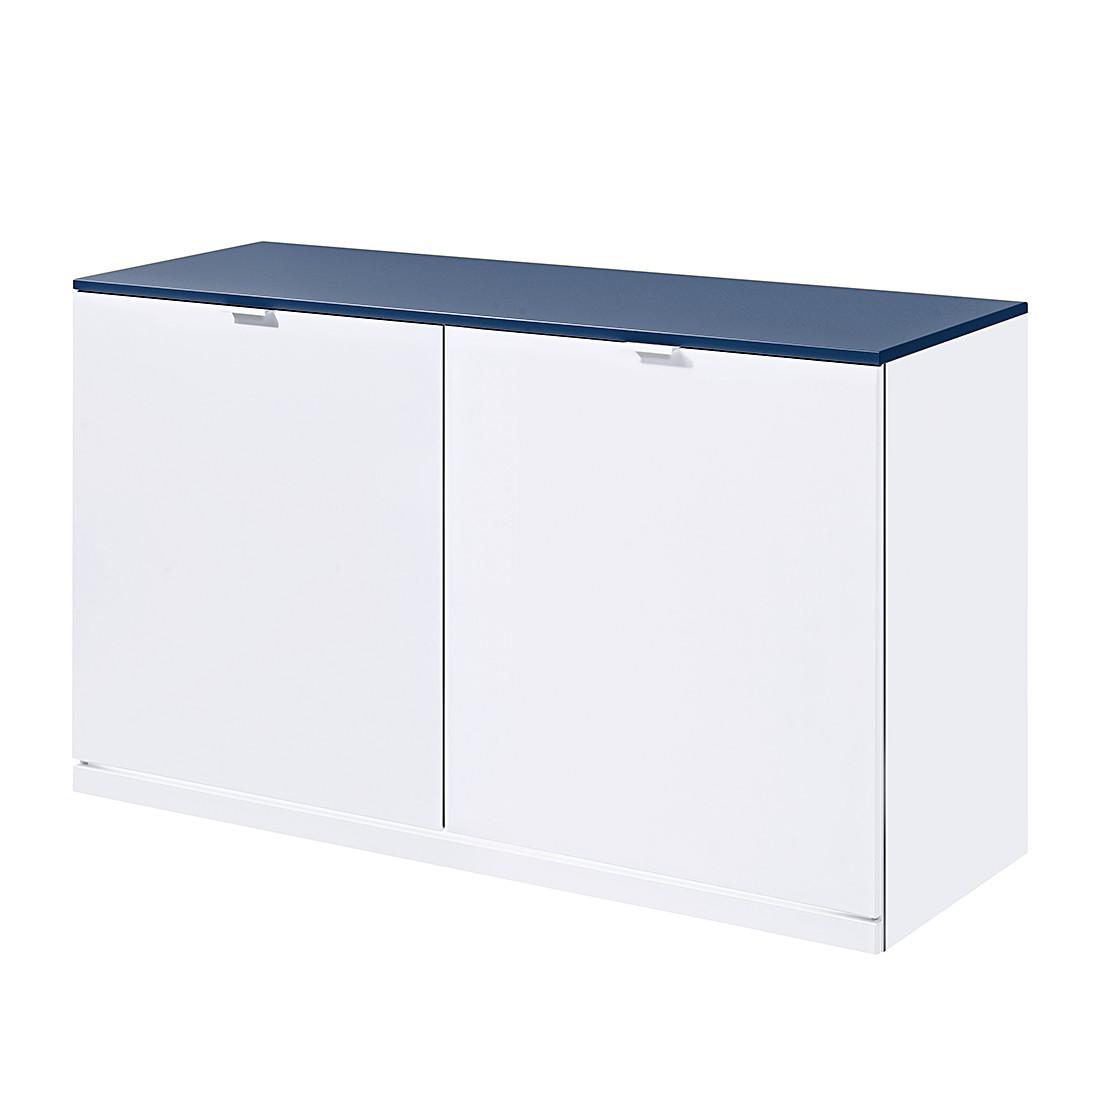 sideboard vip ii wei blau mit led beleuchtung. Black Bedroom Furniture Sets. Home Design Ideas